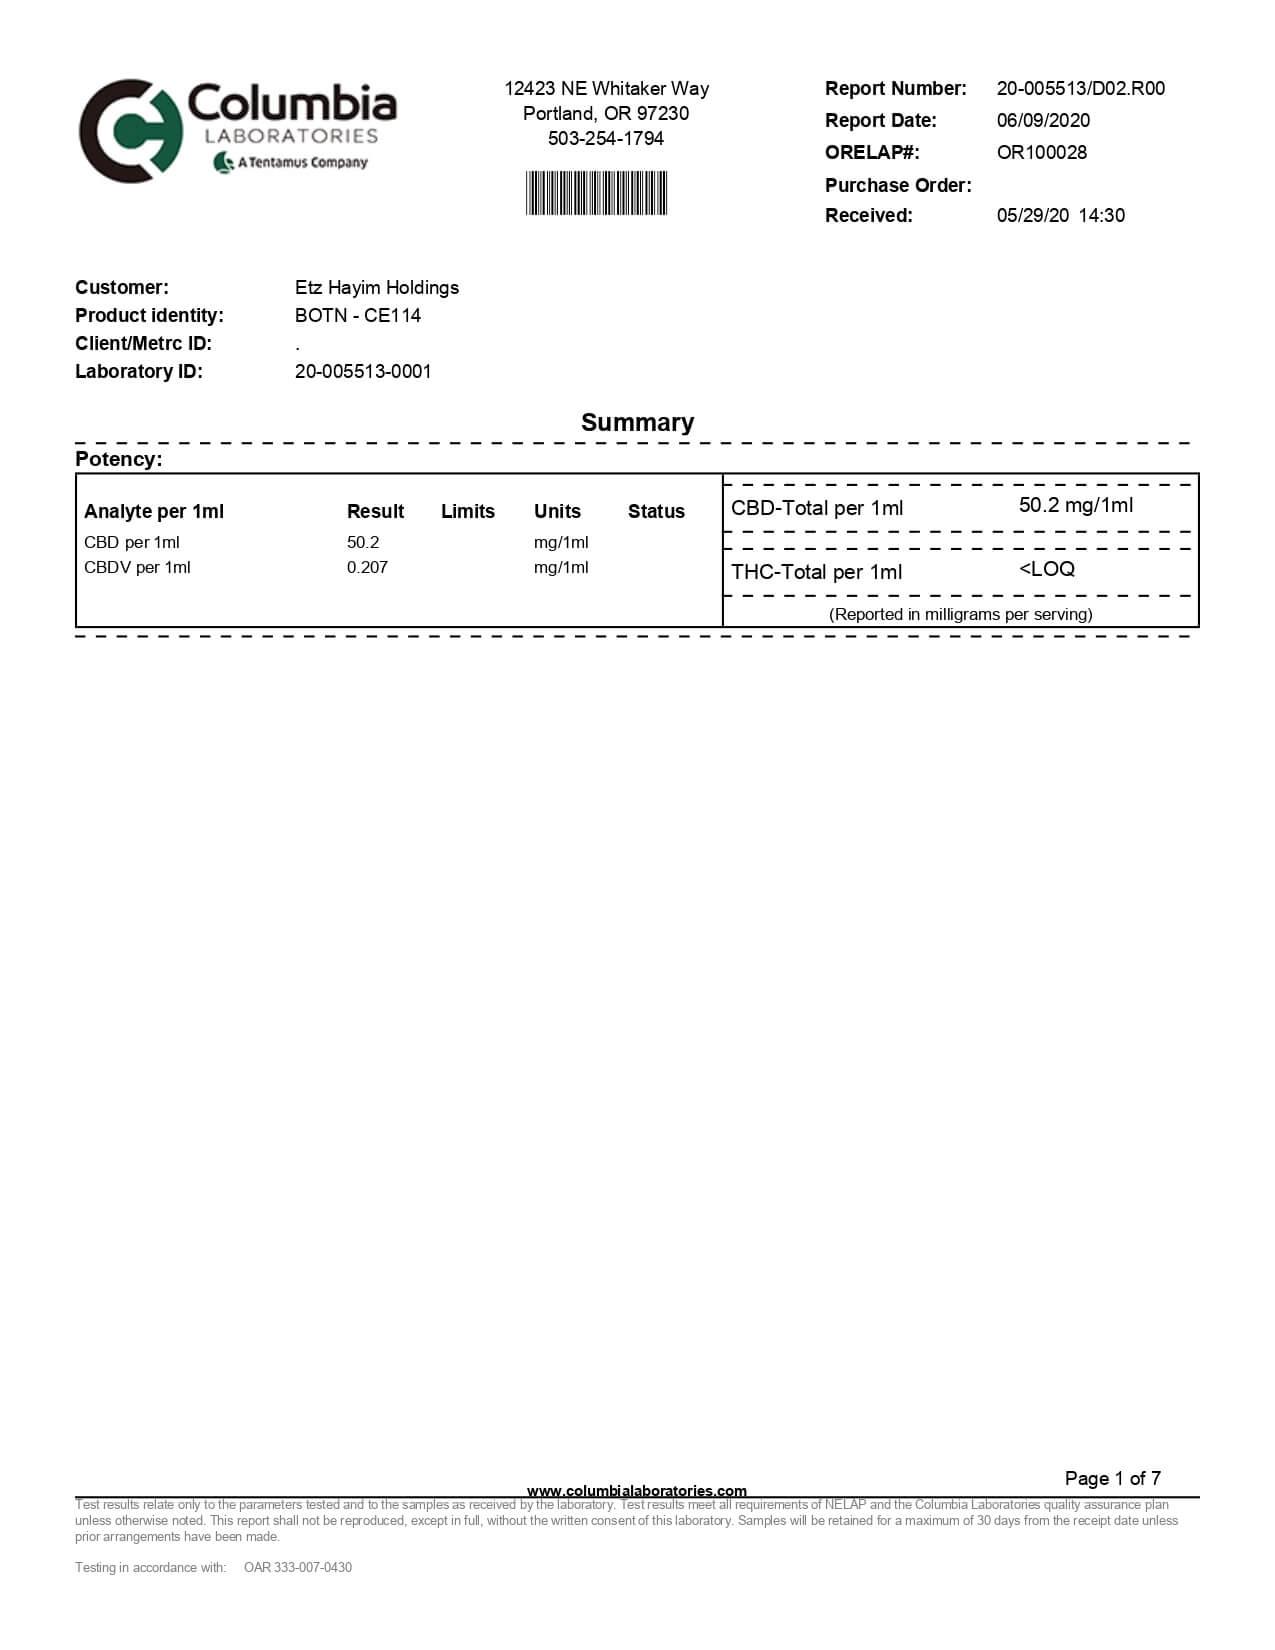 Lazarus Naturals High Potency CBD Tincture Blood Orange Lab Report